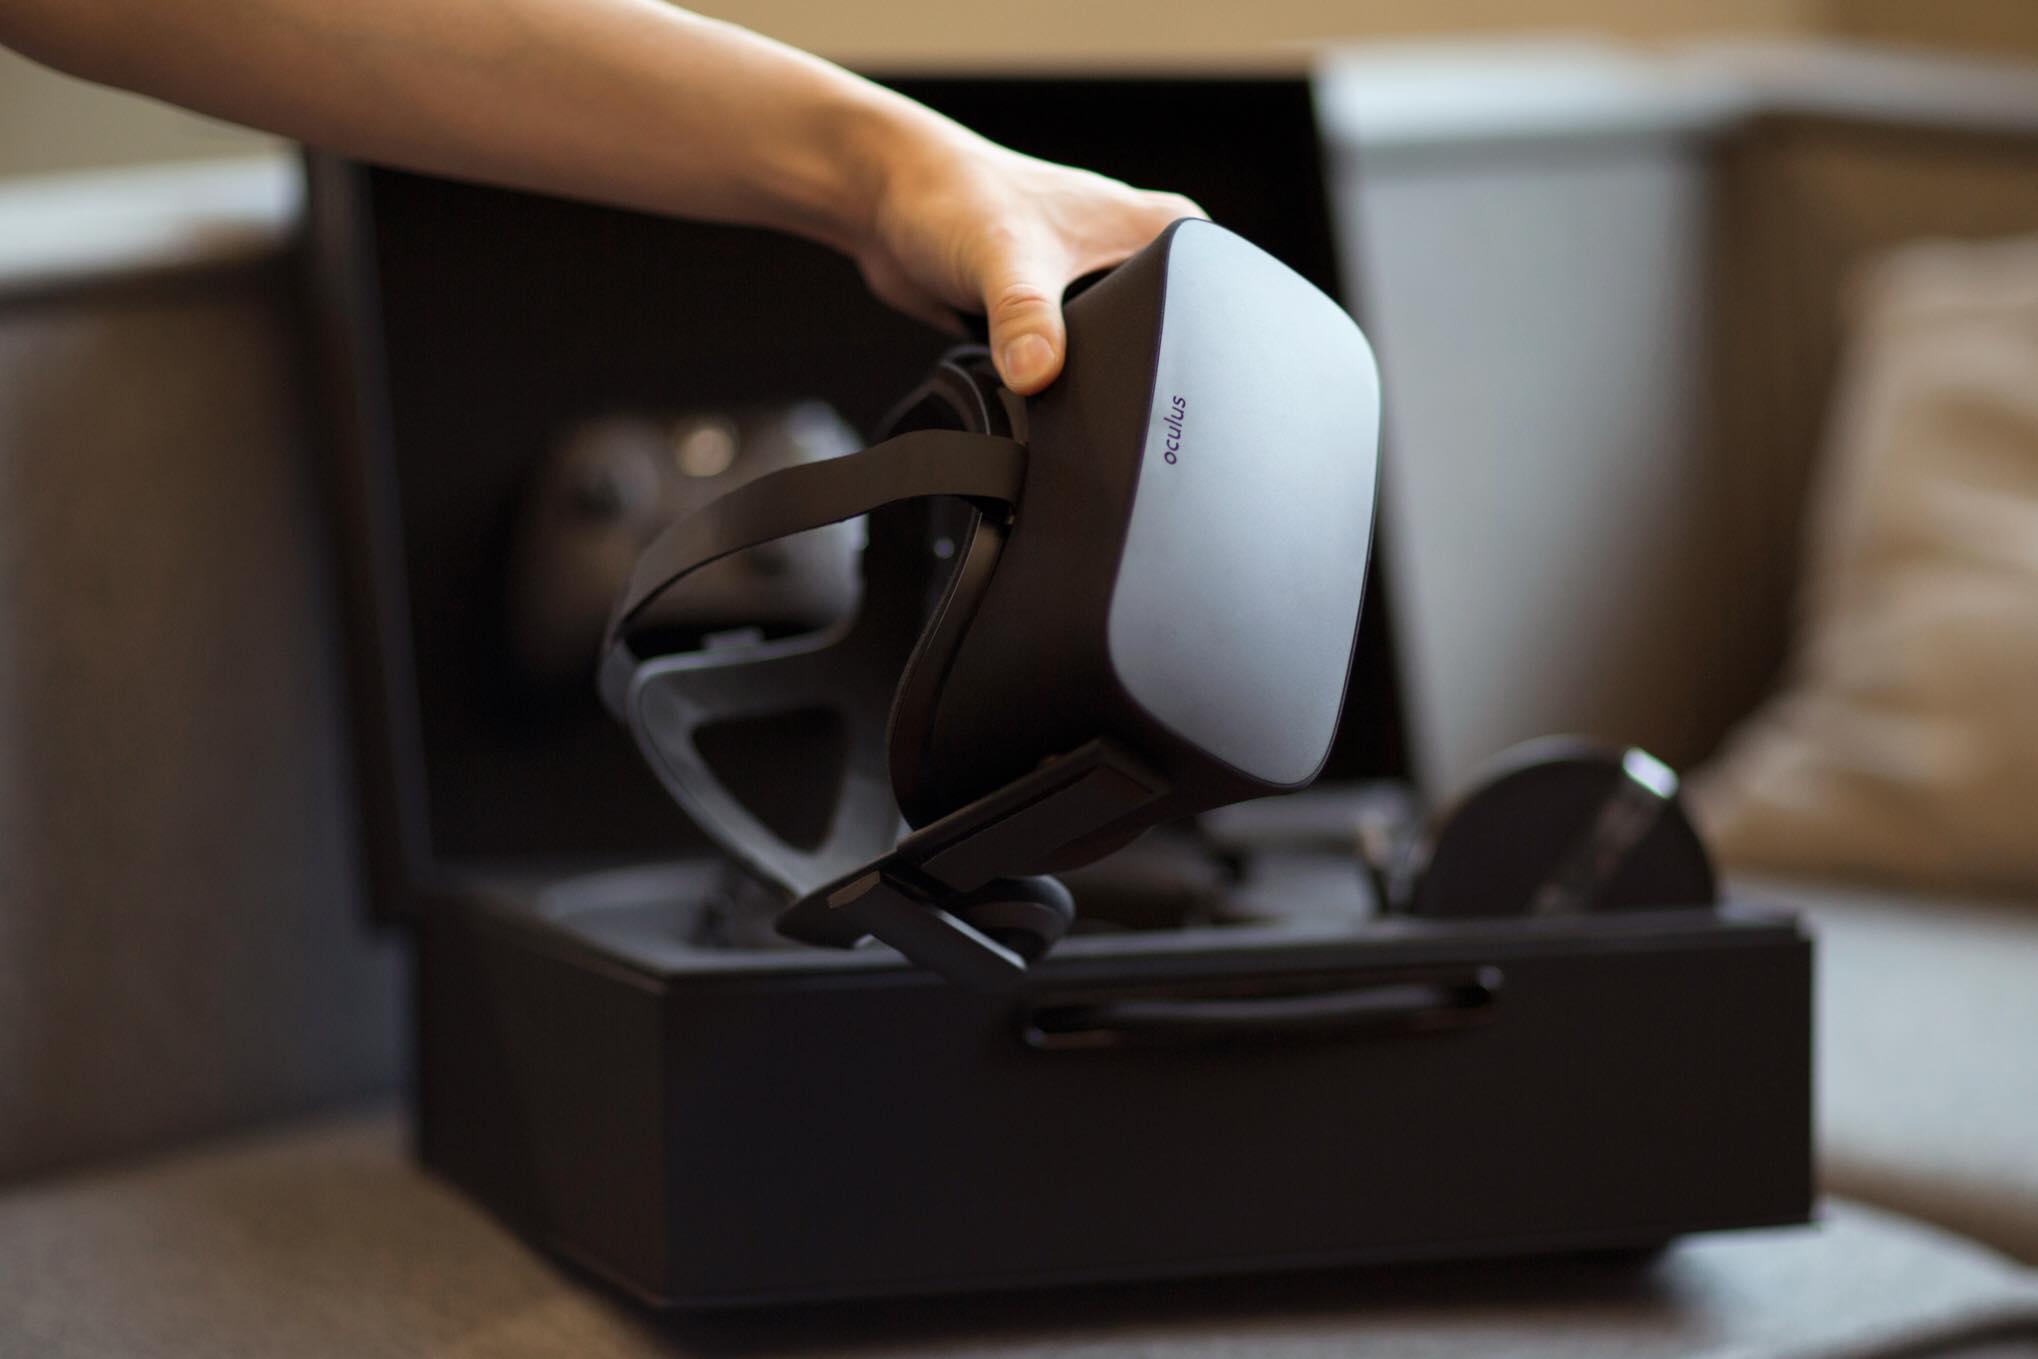 Photo of an Oculus Rift virtual reality headset.